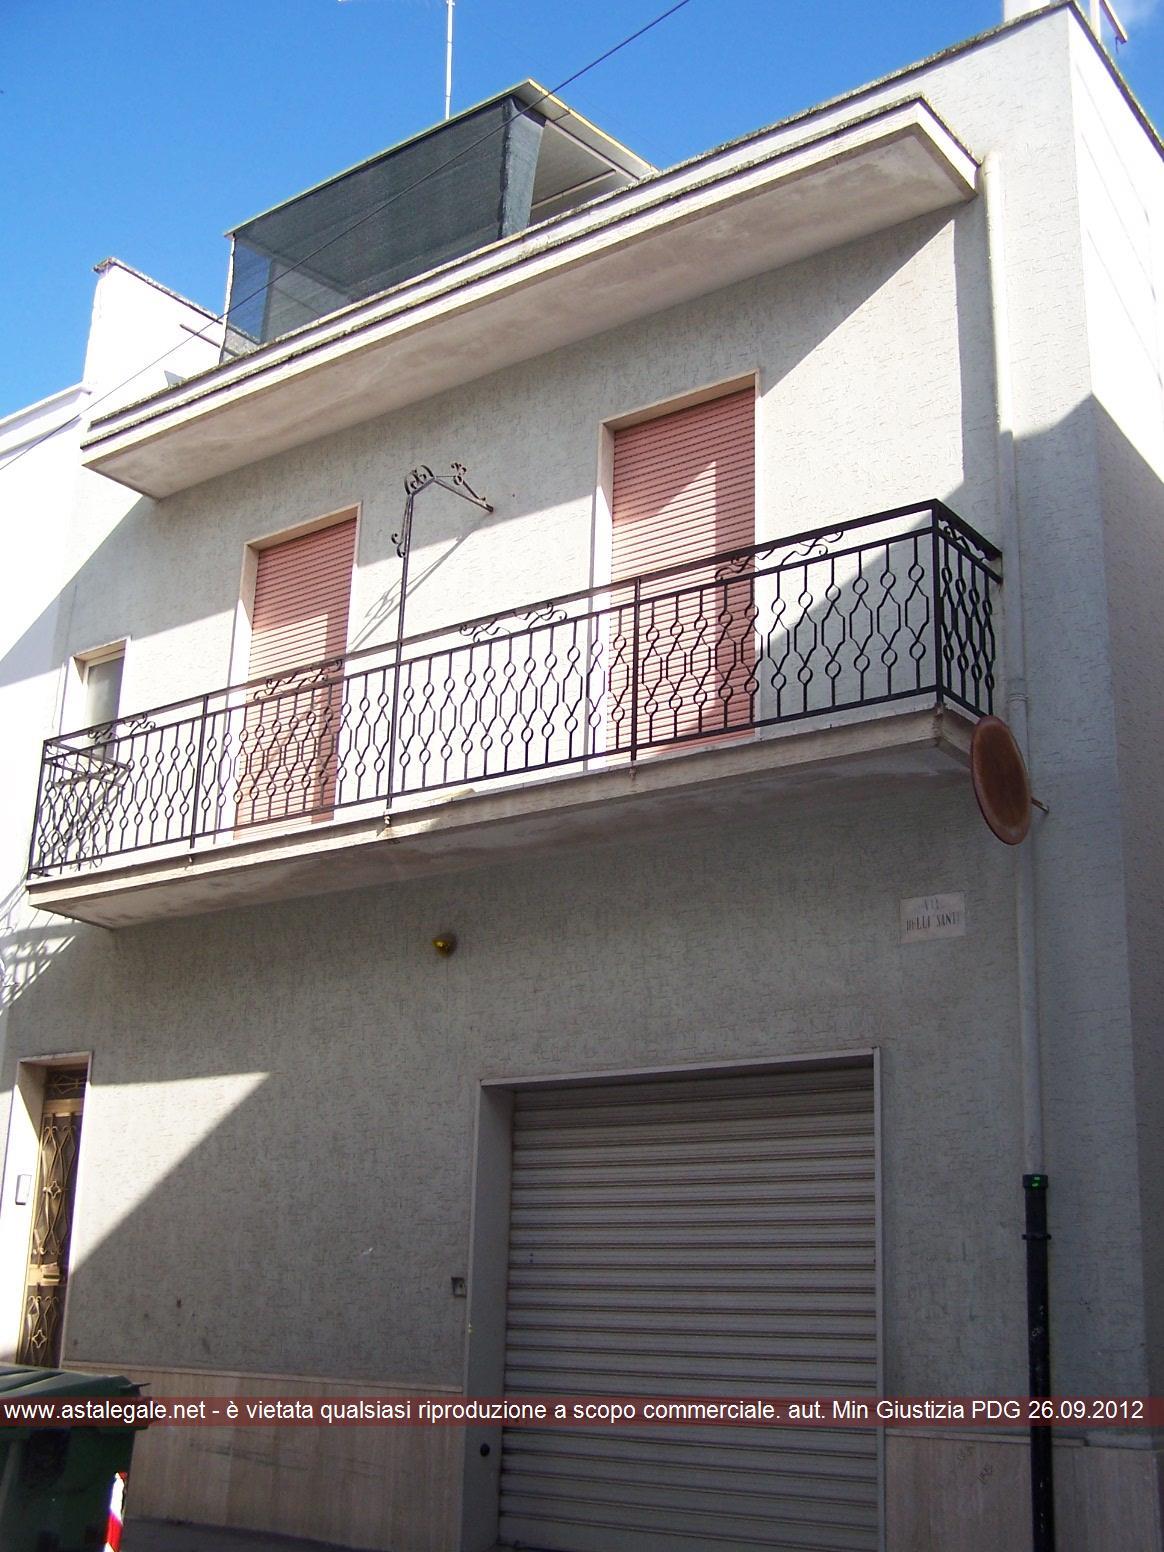 Francavilla Fontana (BR) Via Delli santi 33